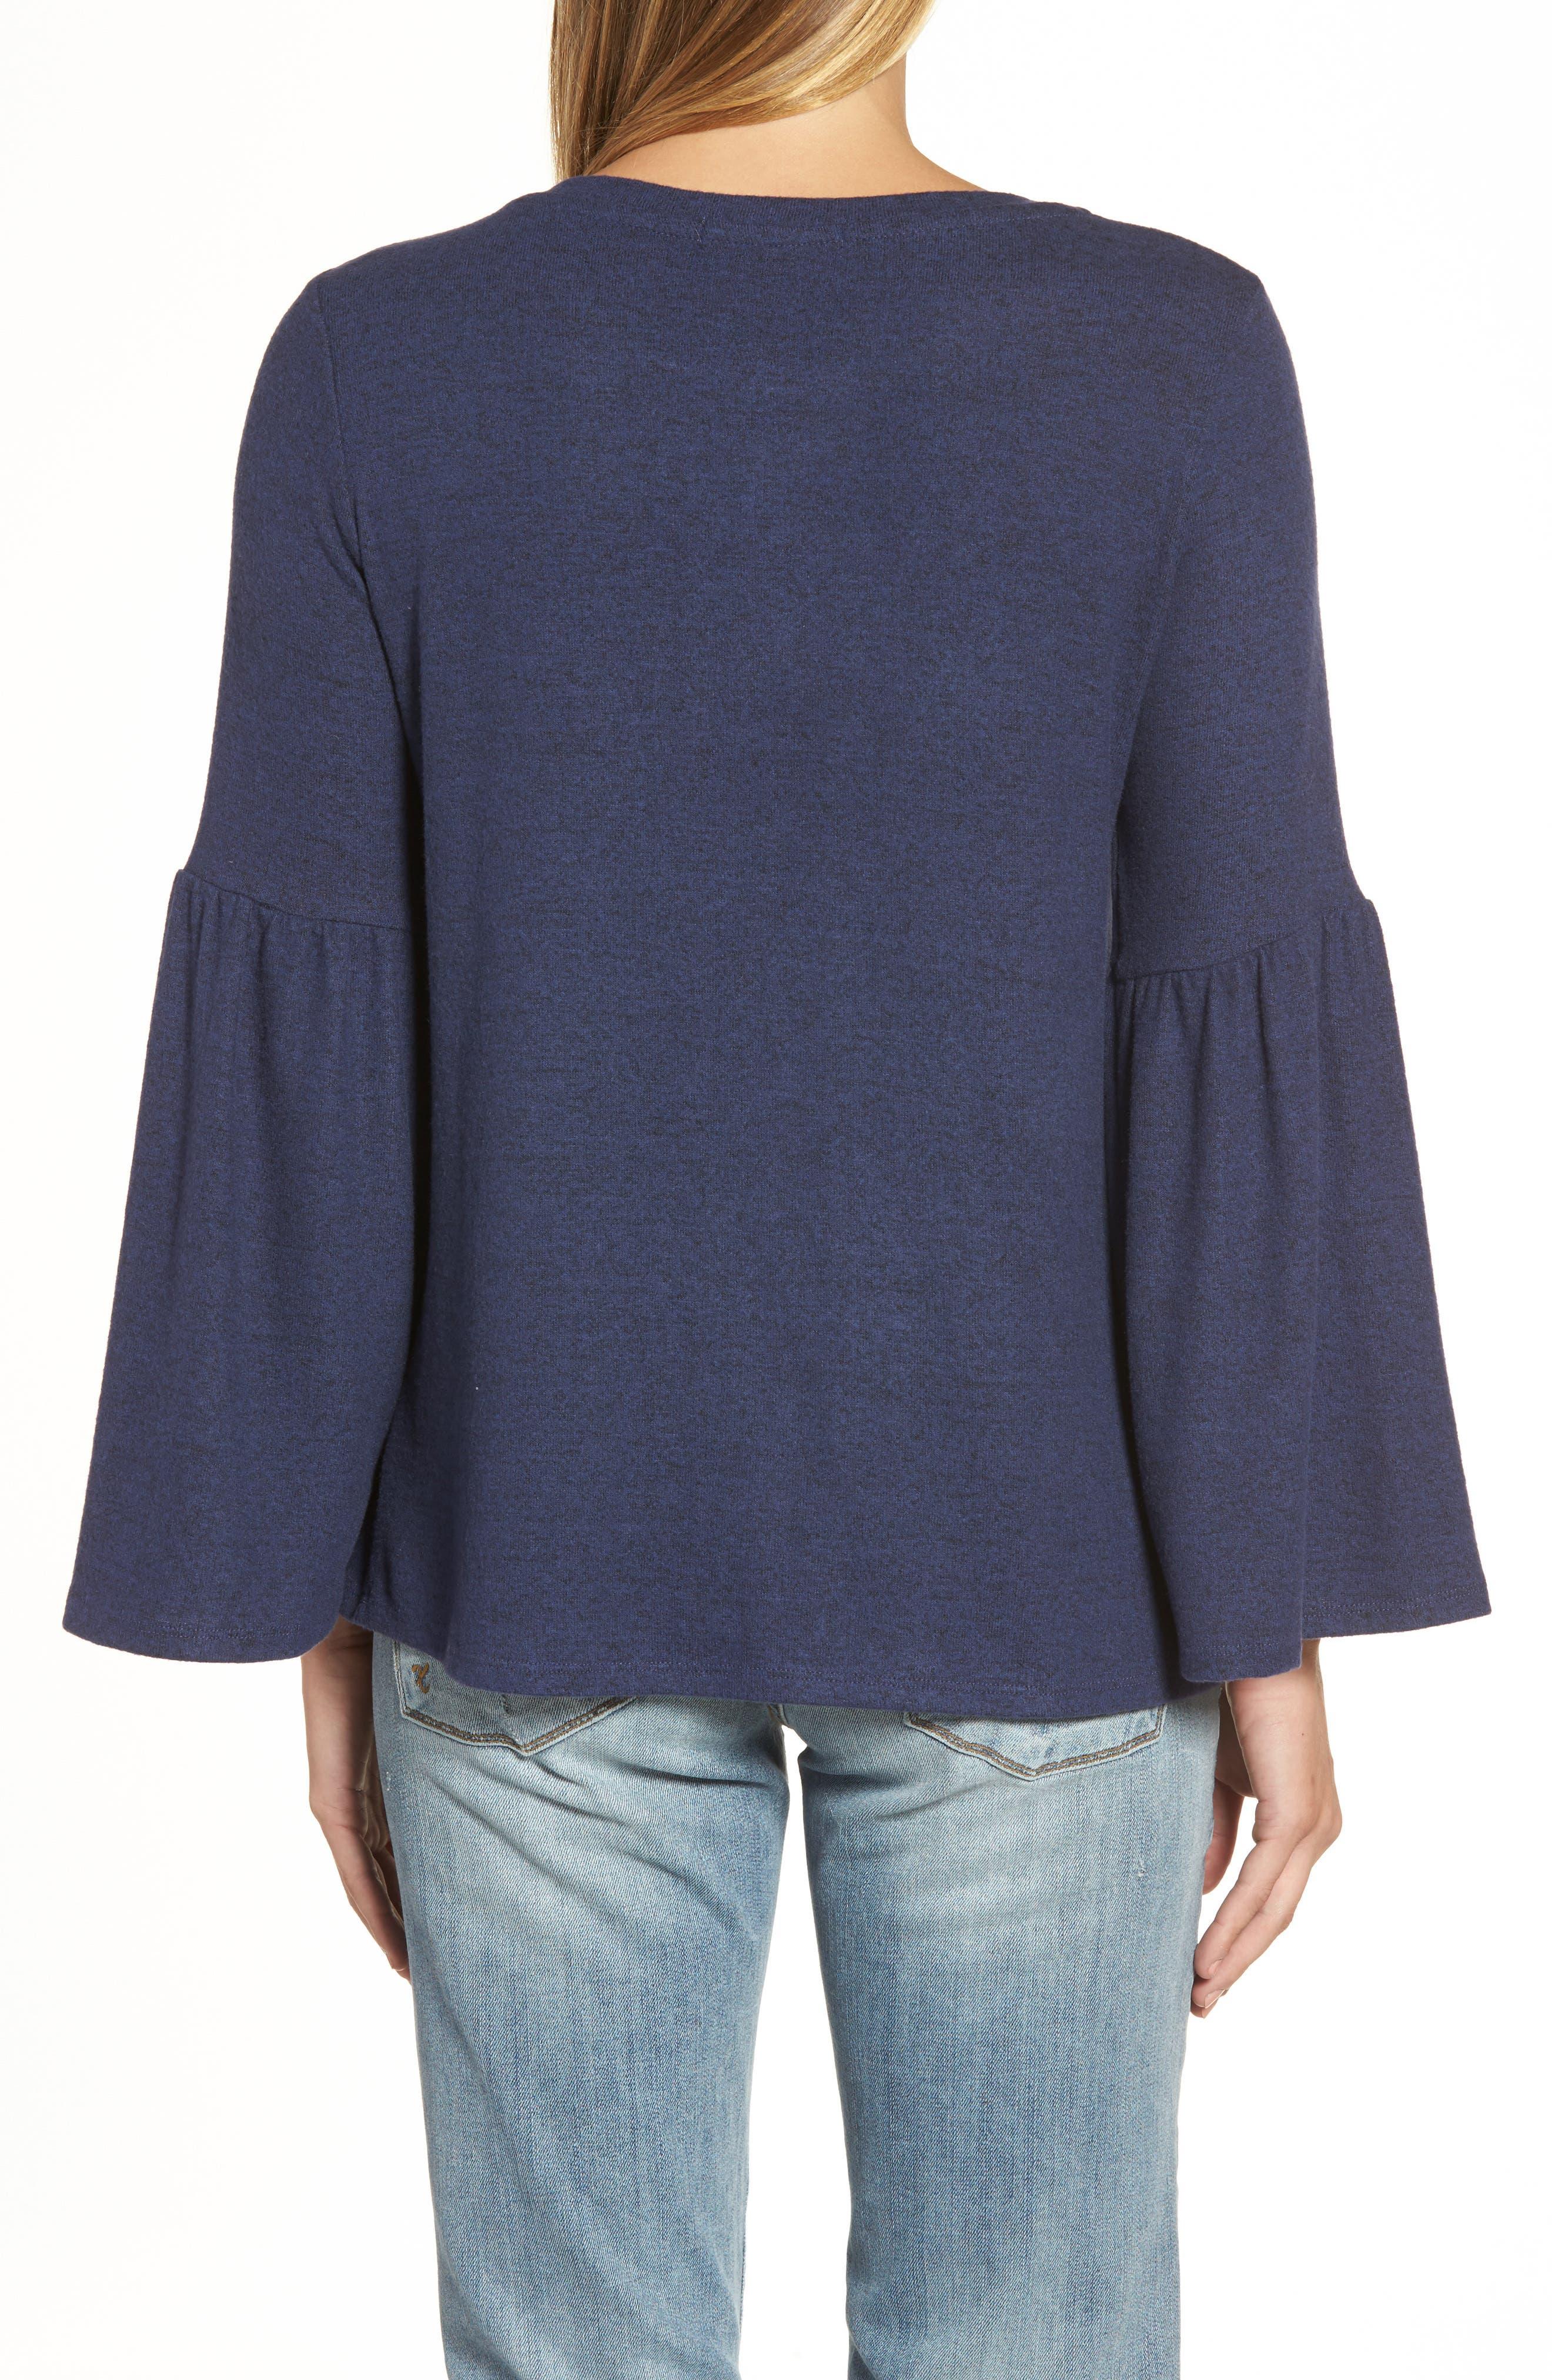 GIBSON,                             Bell Sleeve Cozy Fleece Pullover,                             Alternate thumbnail 5, color,                             415